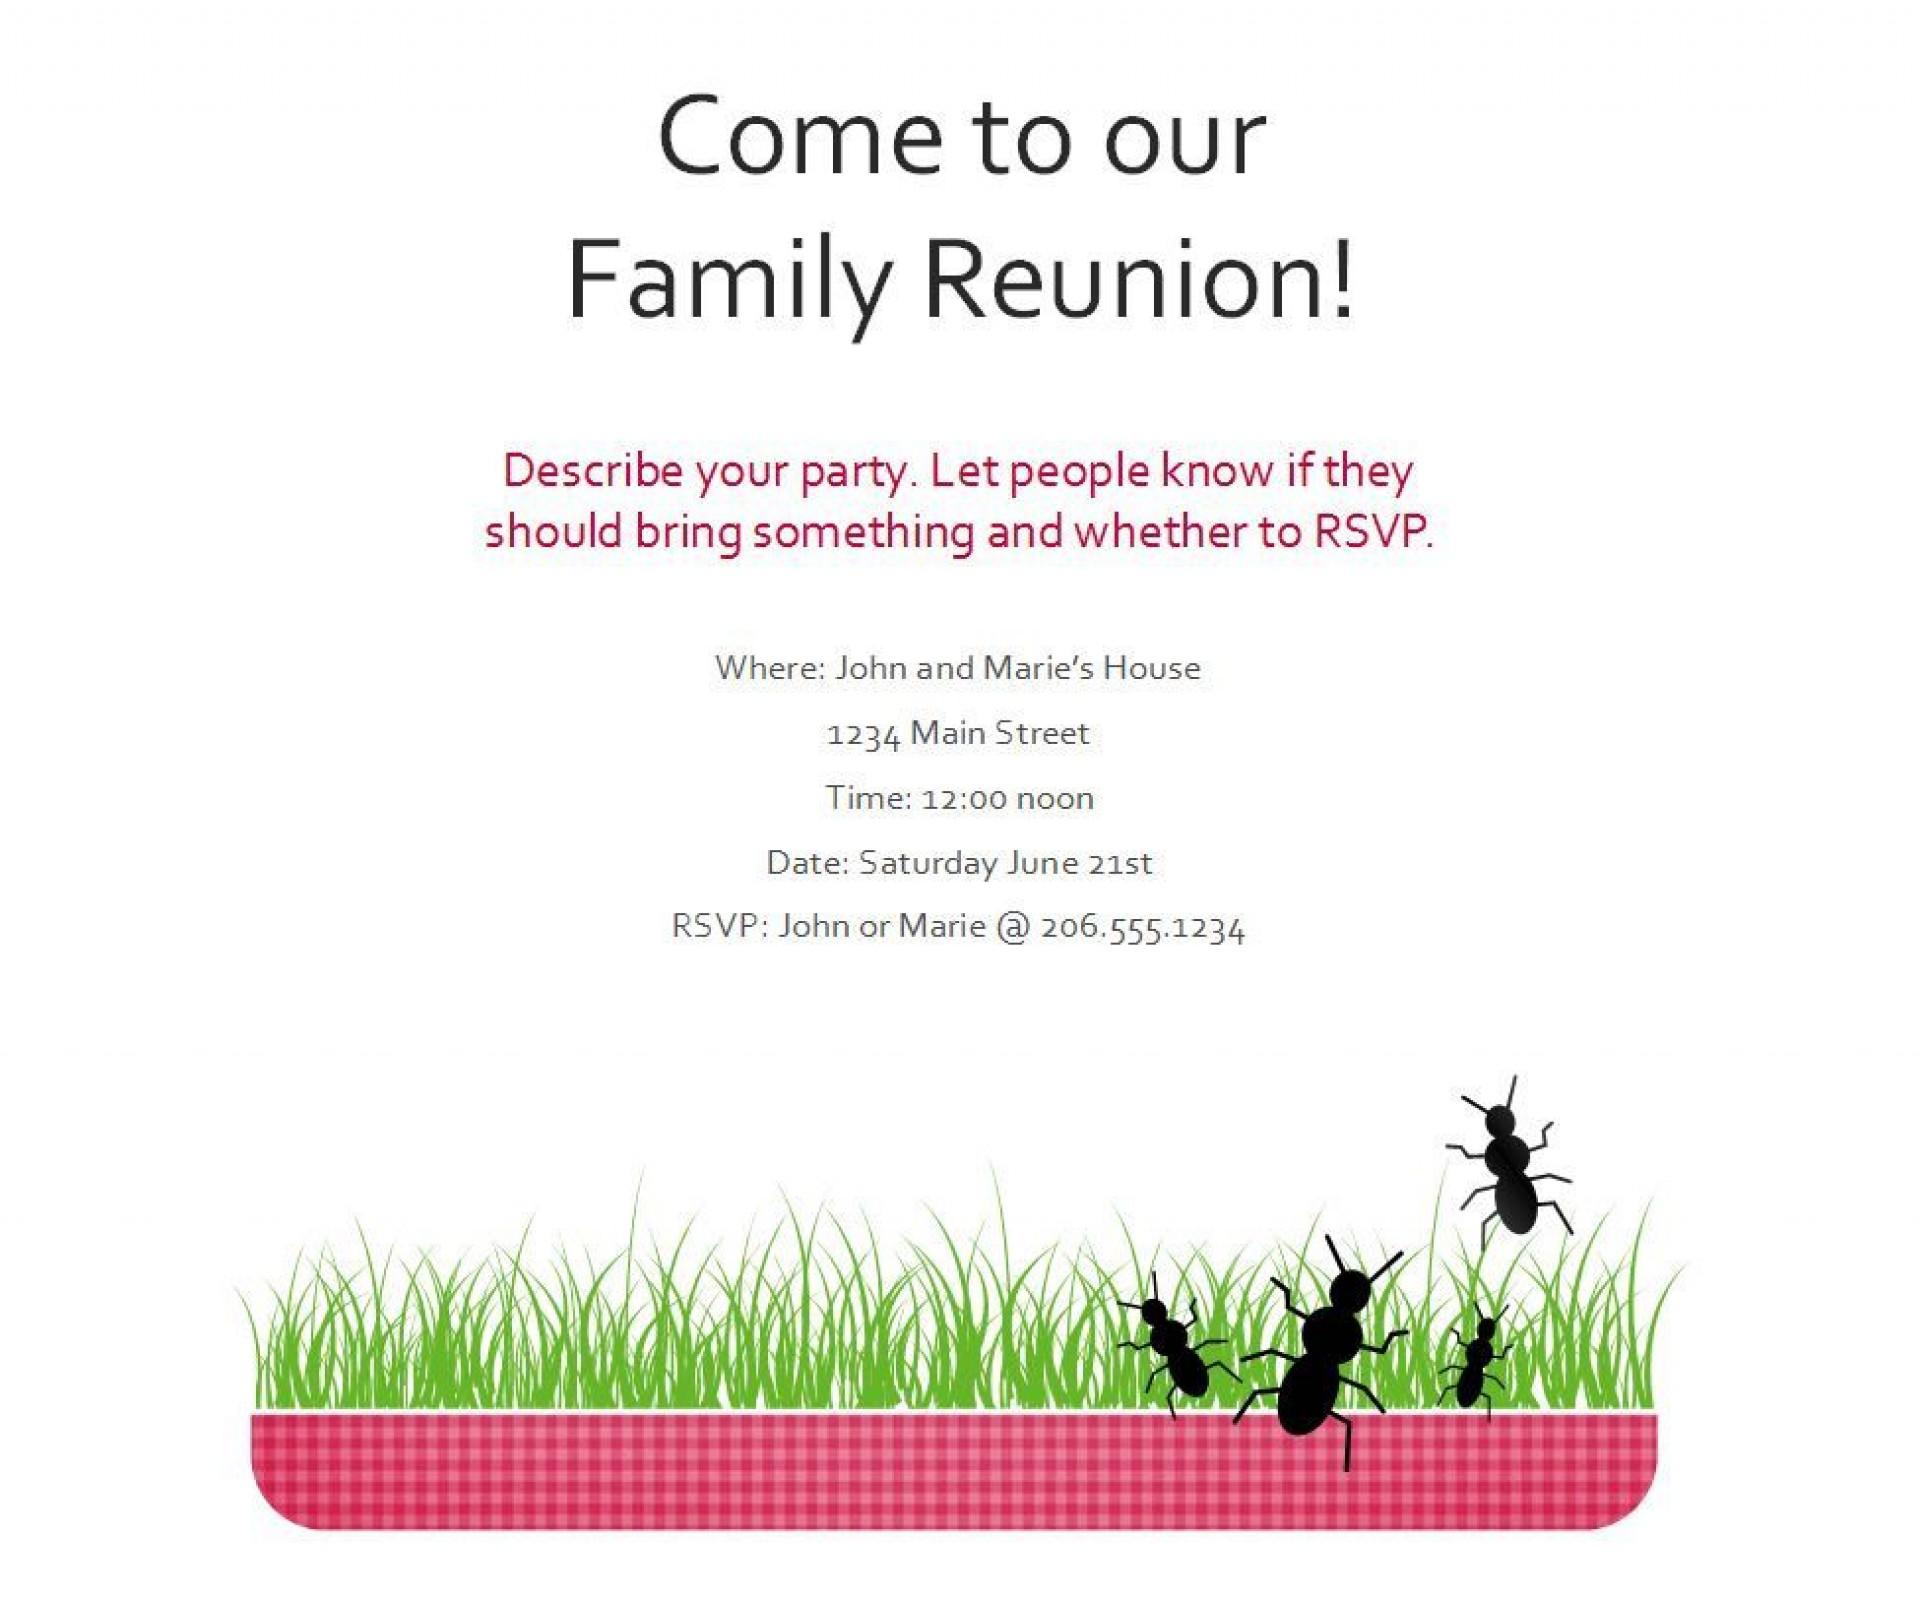 005 Singular Free Family Reunion Flyer Template Word High Def 1920